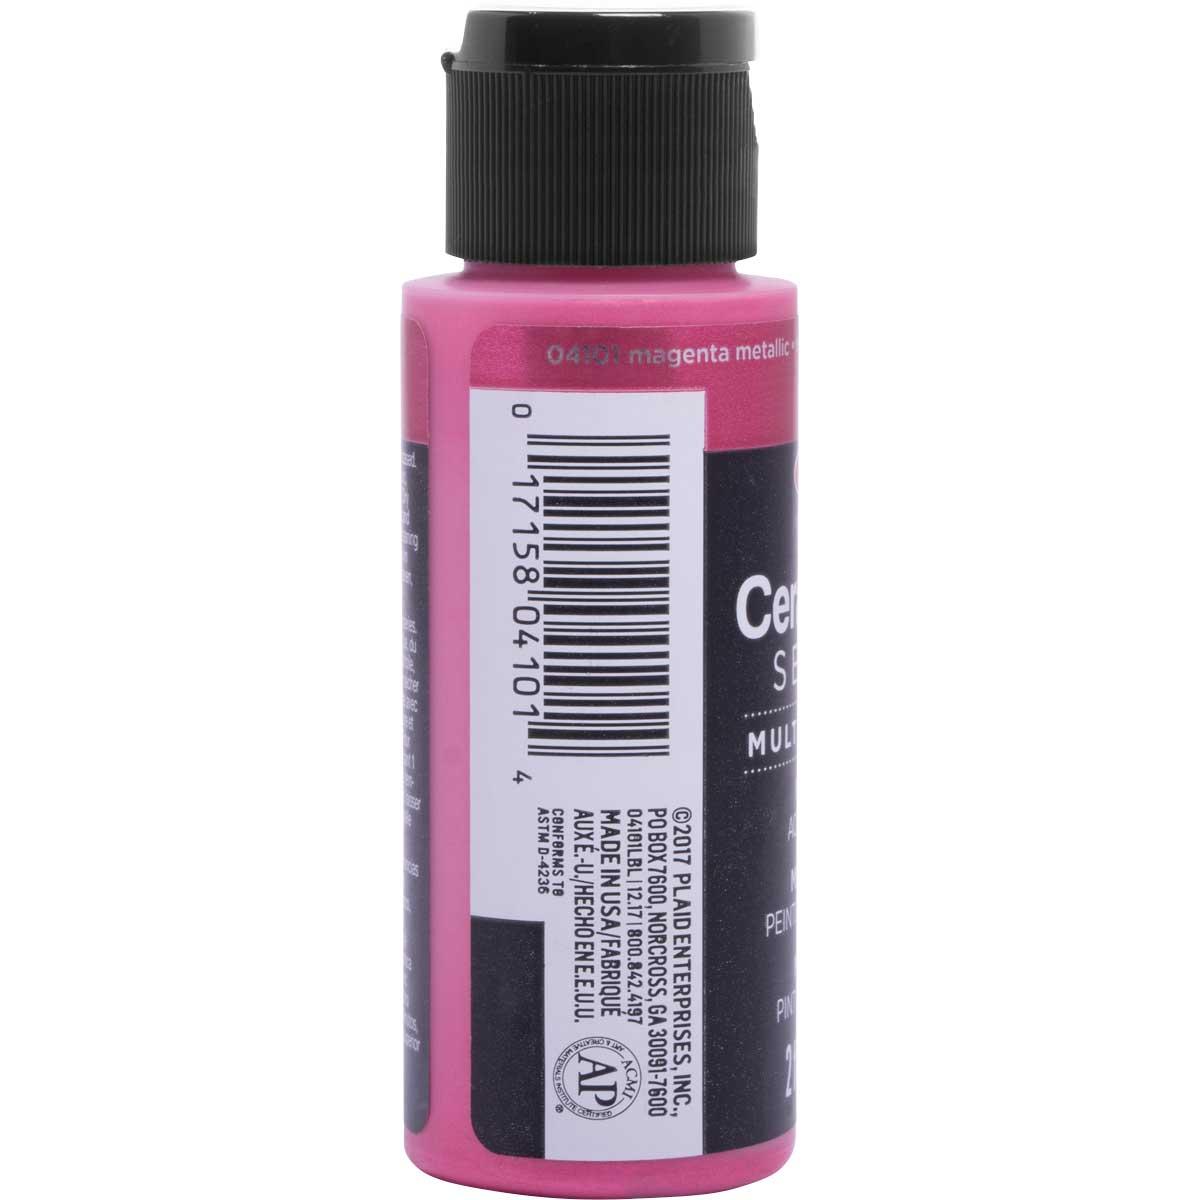 Delta Ceramcoat ® Select Multi-Surface Acrylic Paint - Metallic - Magenta, 2 oz. - 04101